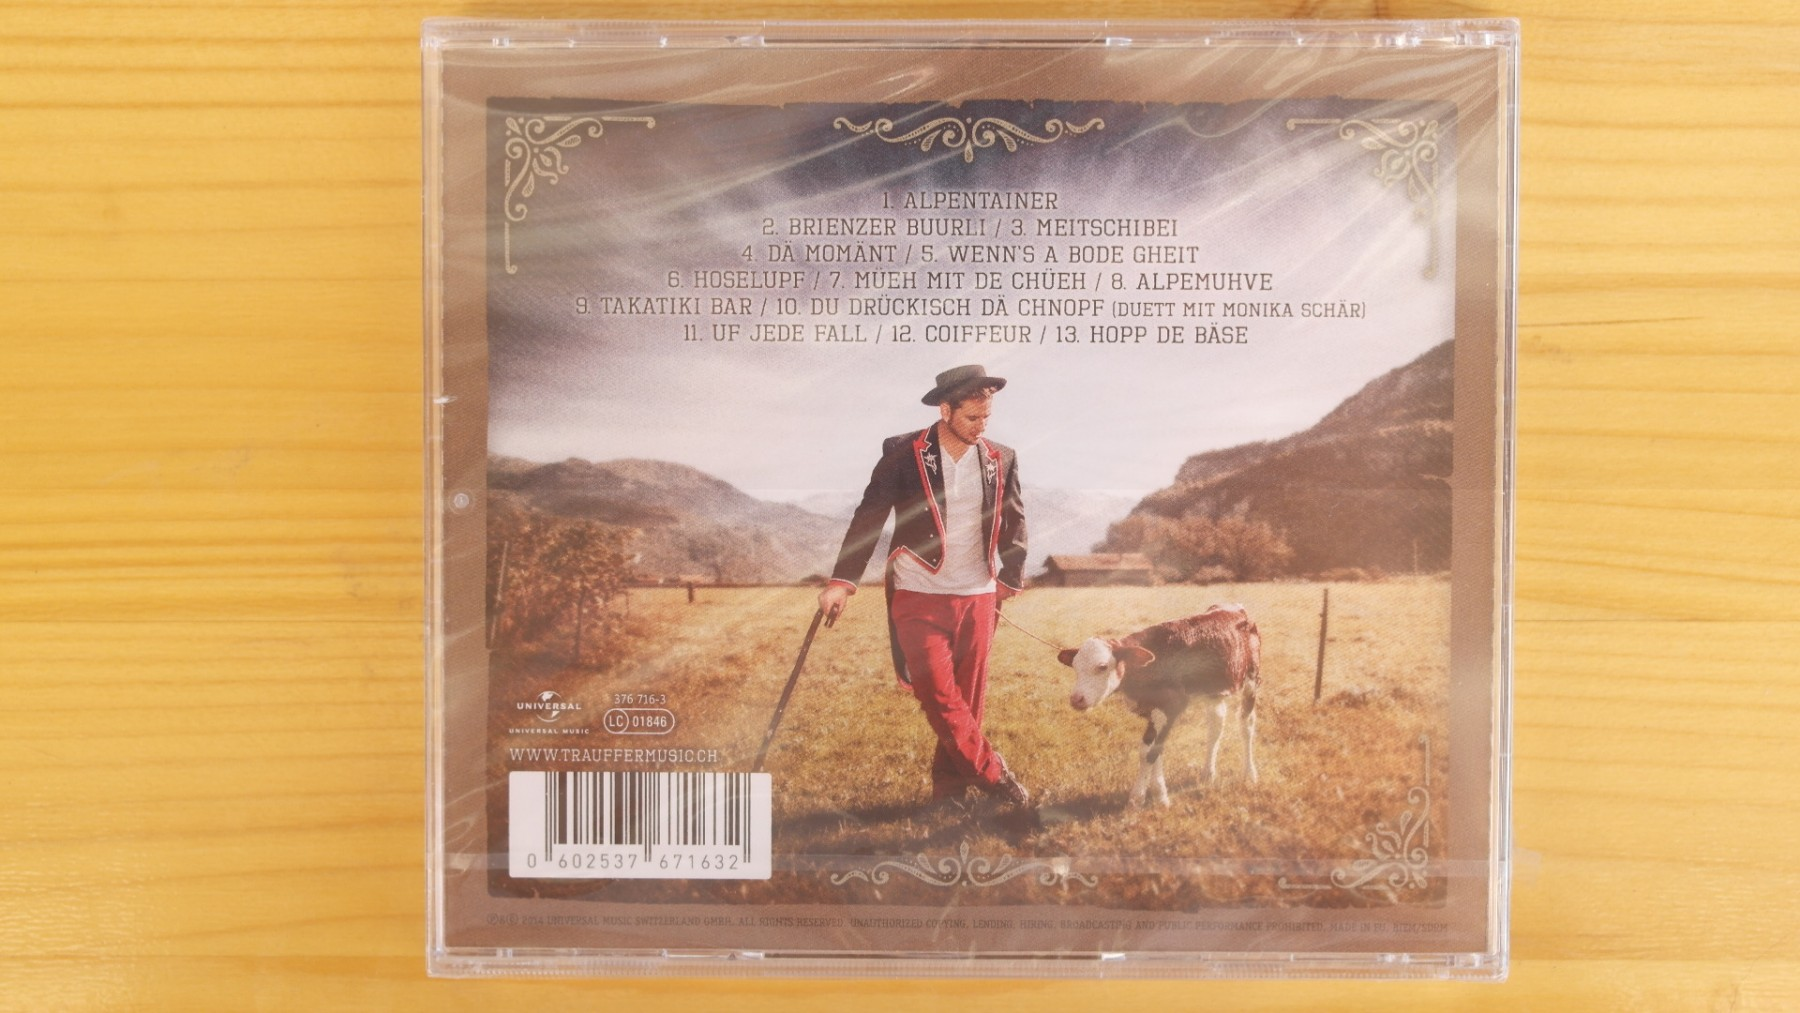 Trauffer Musik - Alpentainer Gold Music Award CD